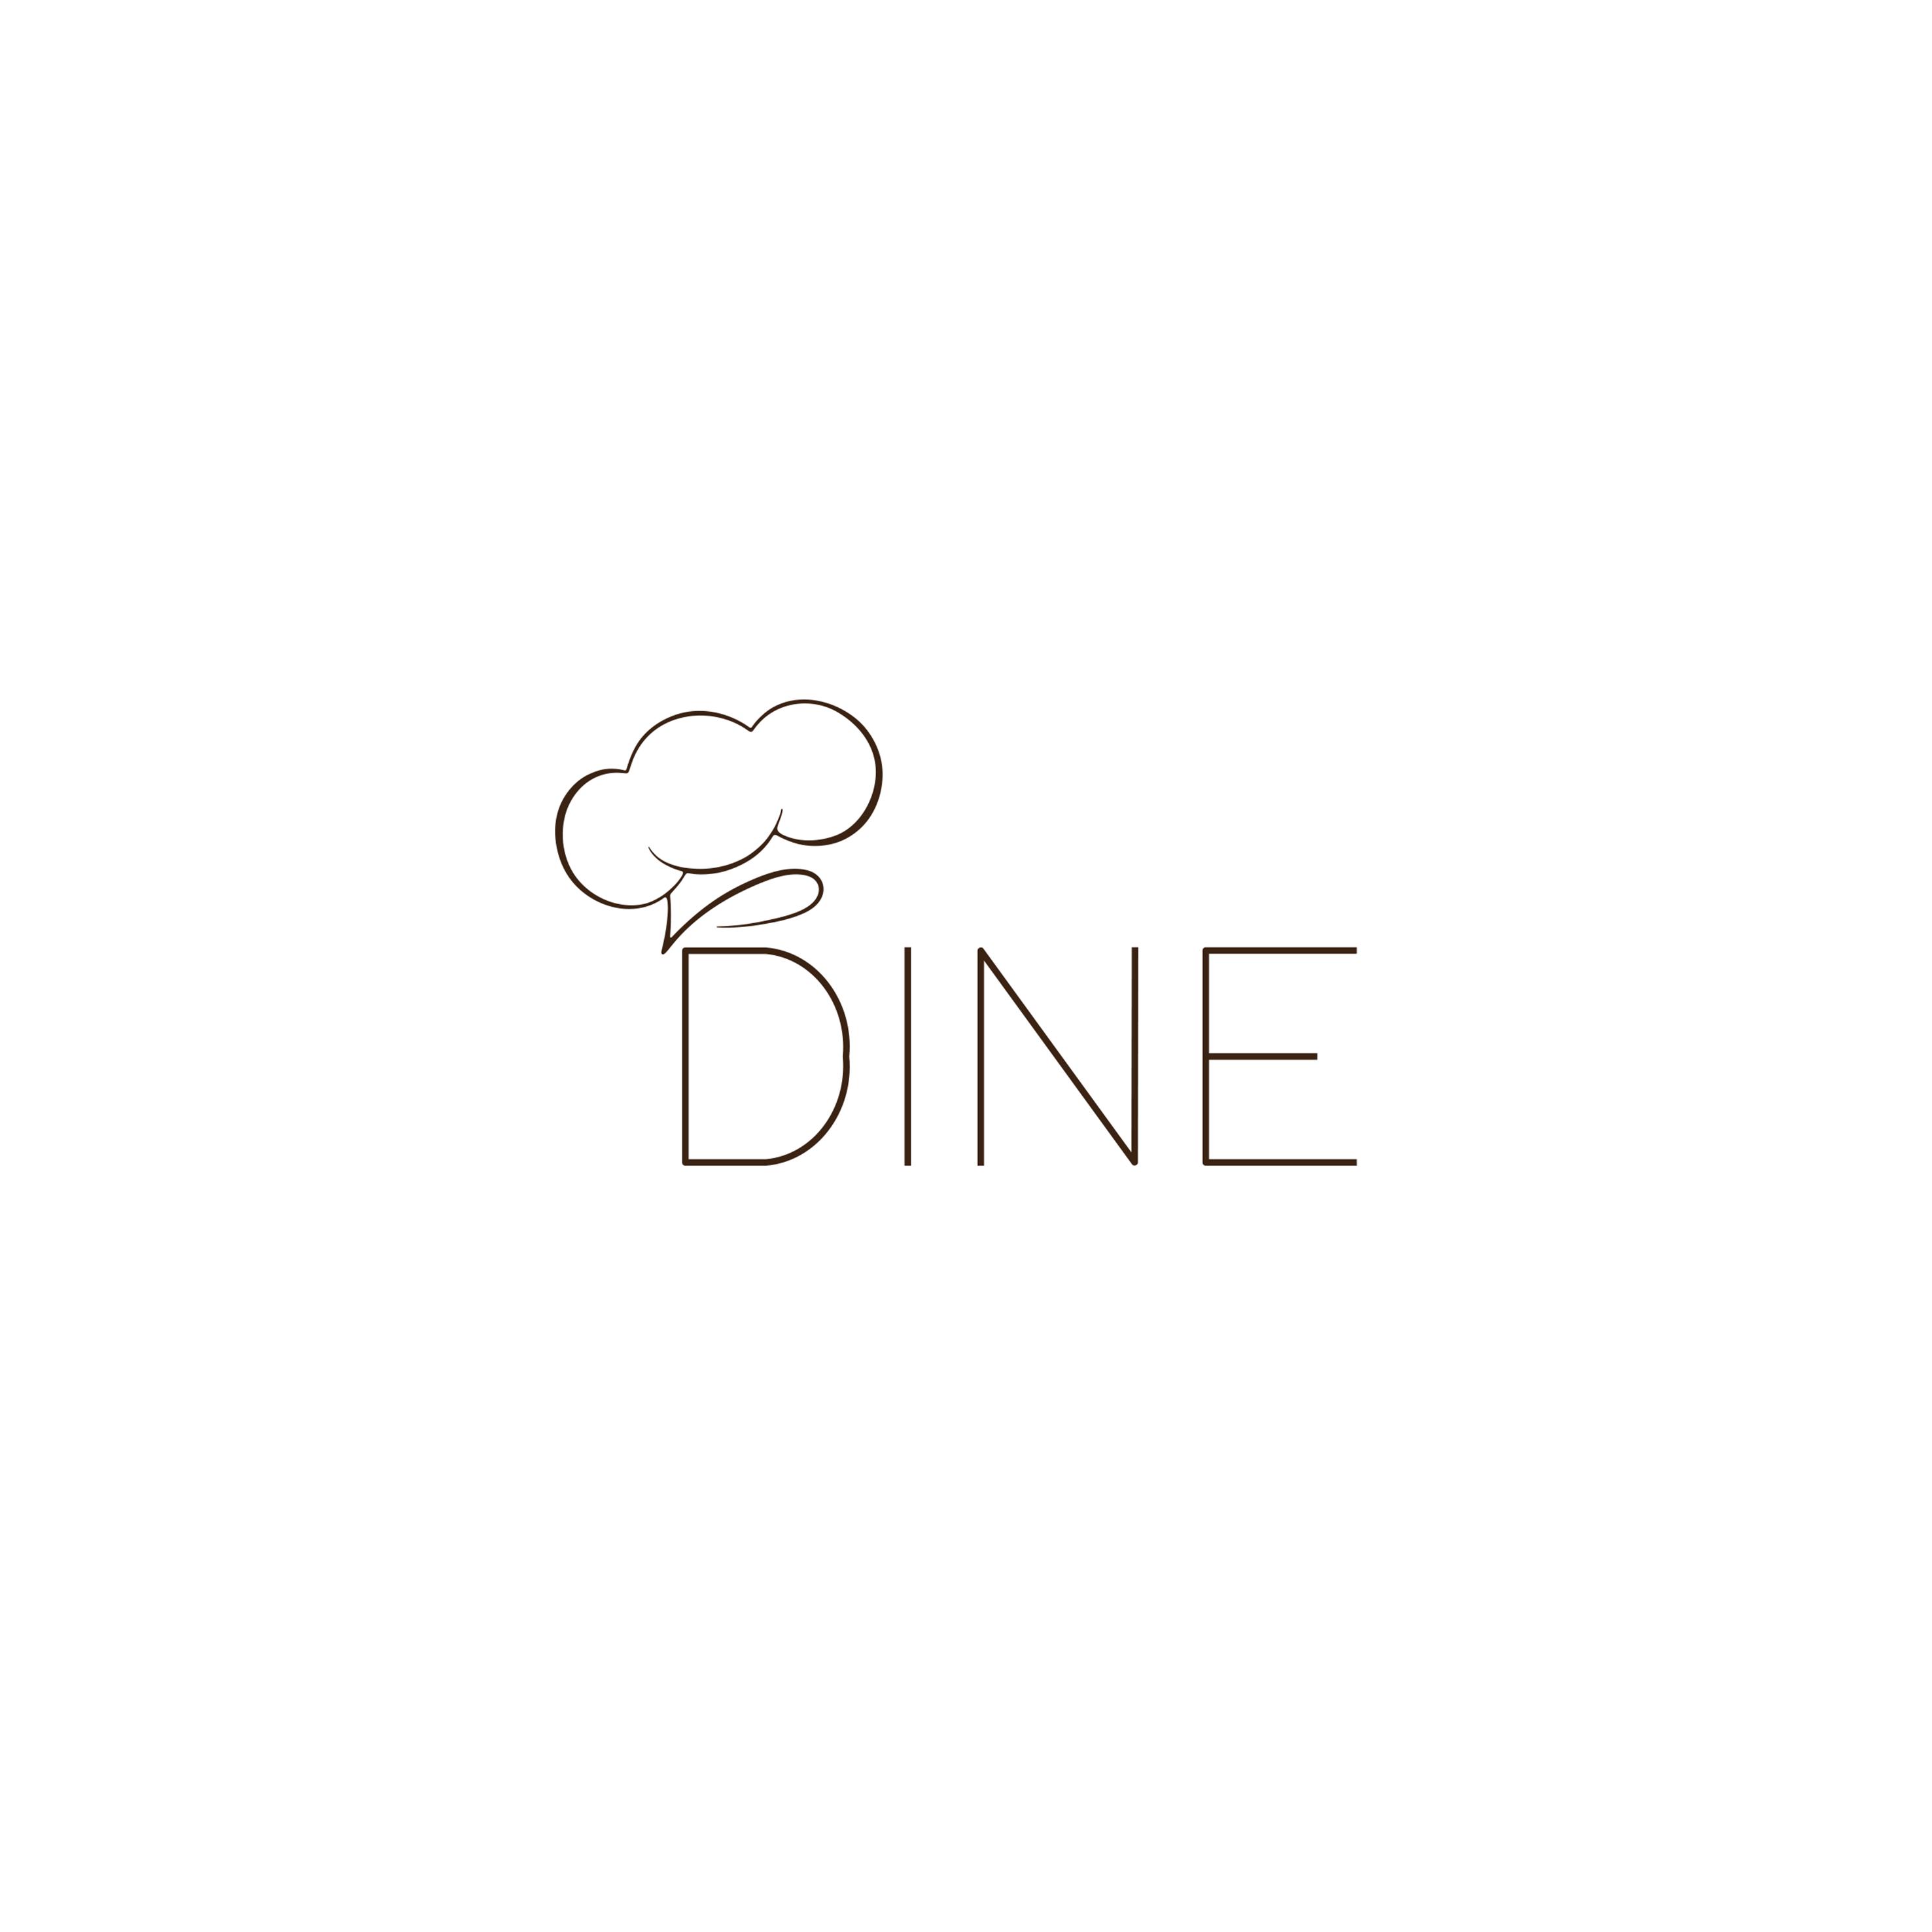 Dine Logo Design